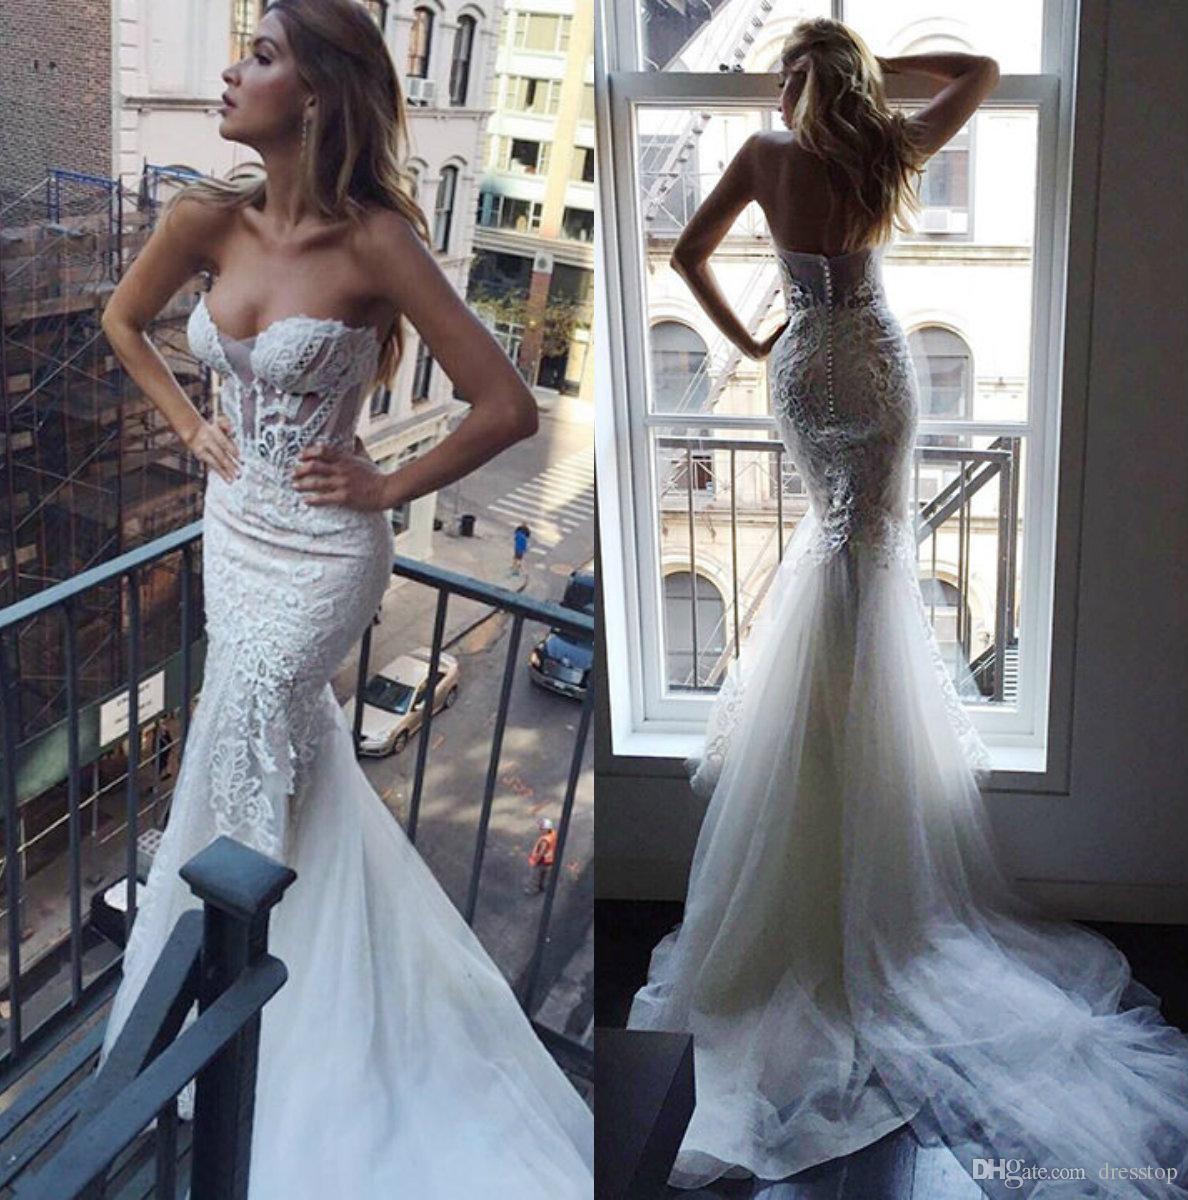 Couture Mermaid Dress